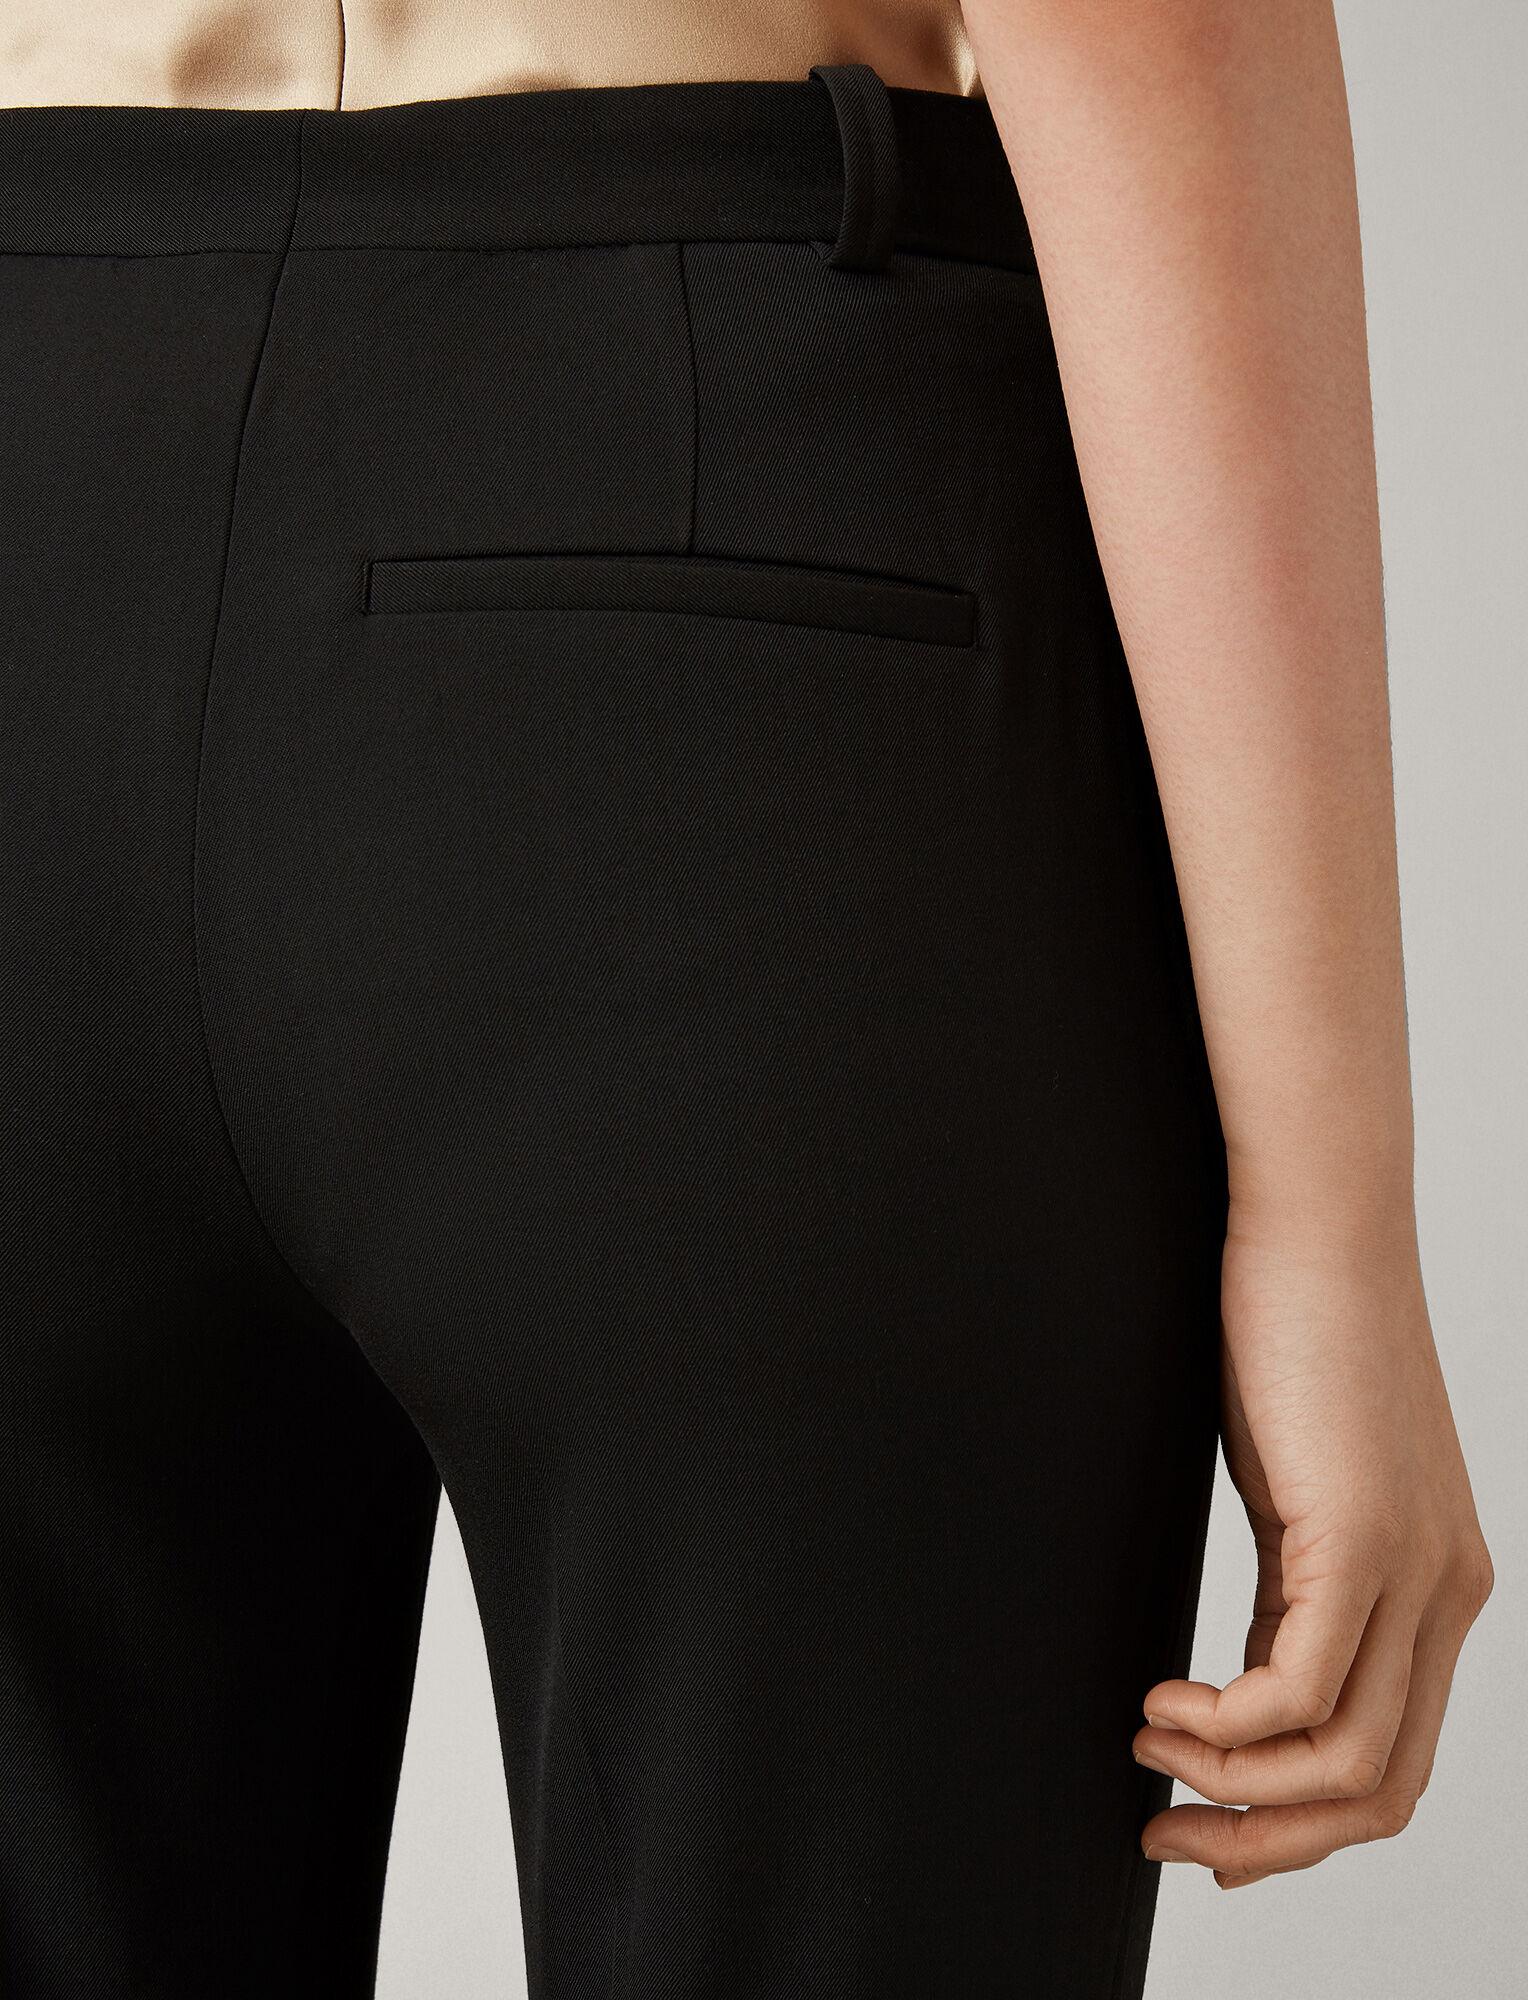 Joseph, Zoom Comfort Wool Trousers, in BLACK